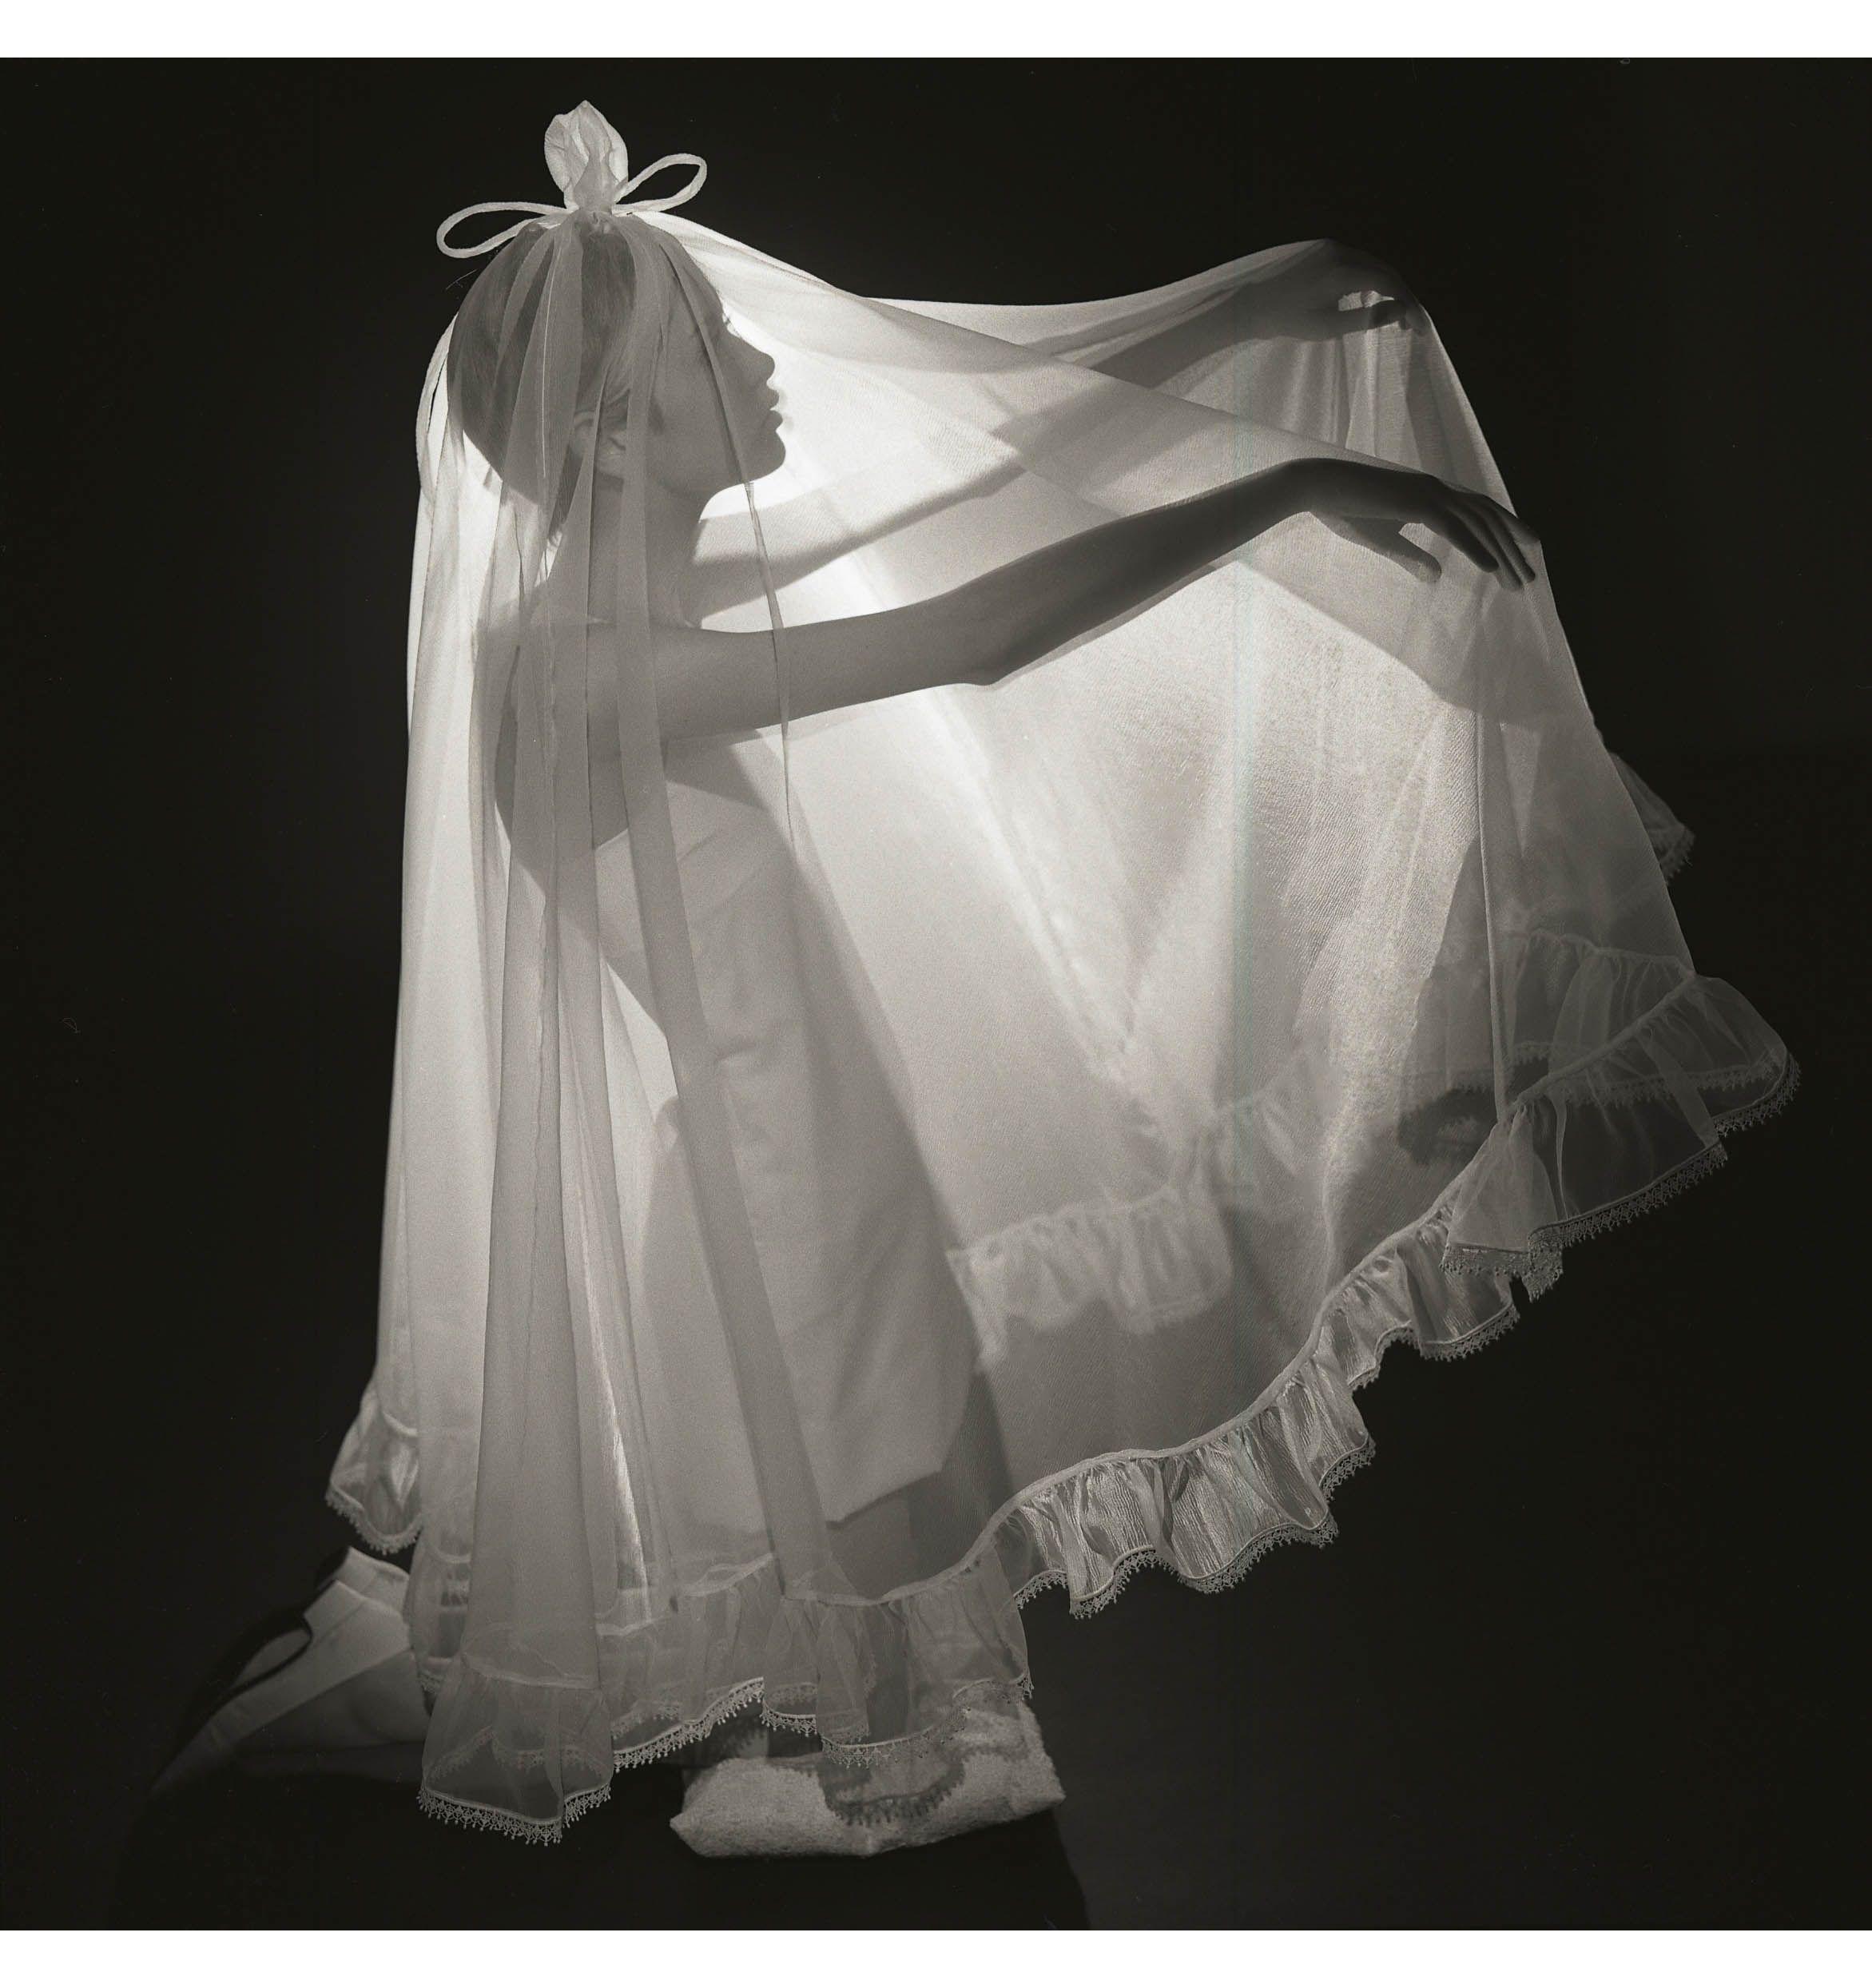 White Weddings Twiggy British Vogue February 1967 Photo